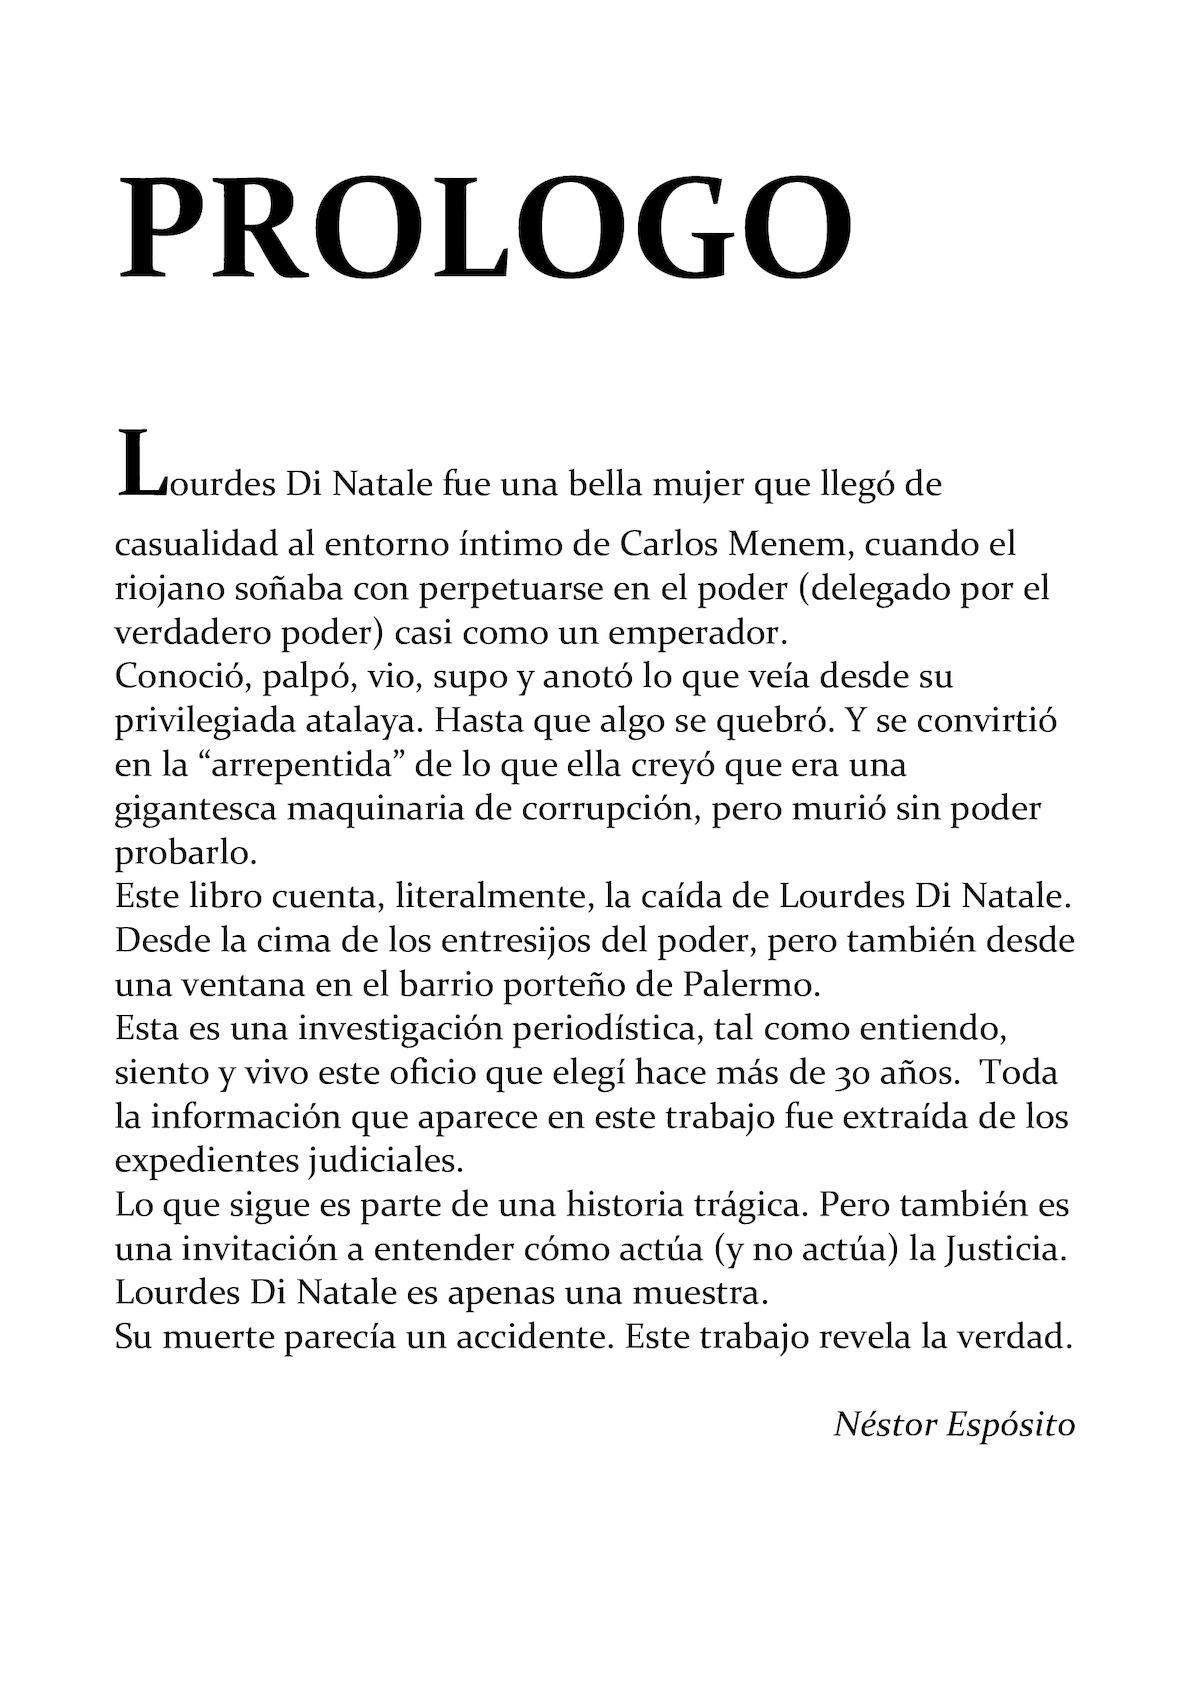 Calaméo - Parecia un accidente - Por: Néstor Espósito